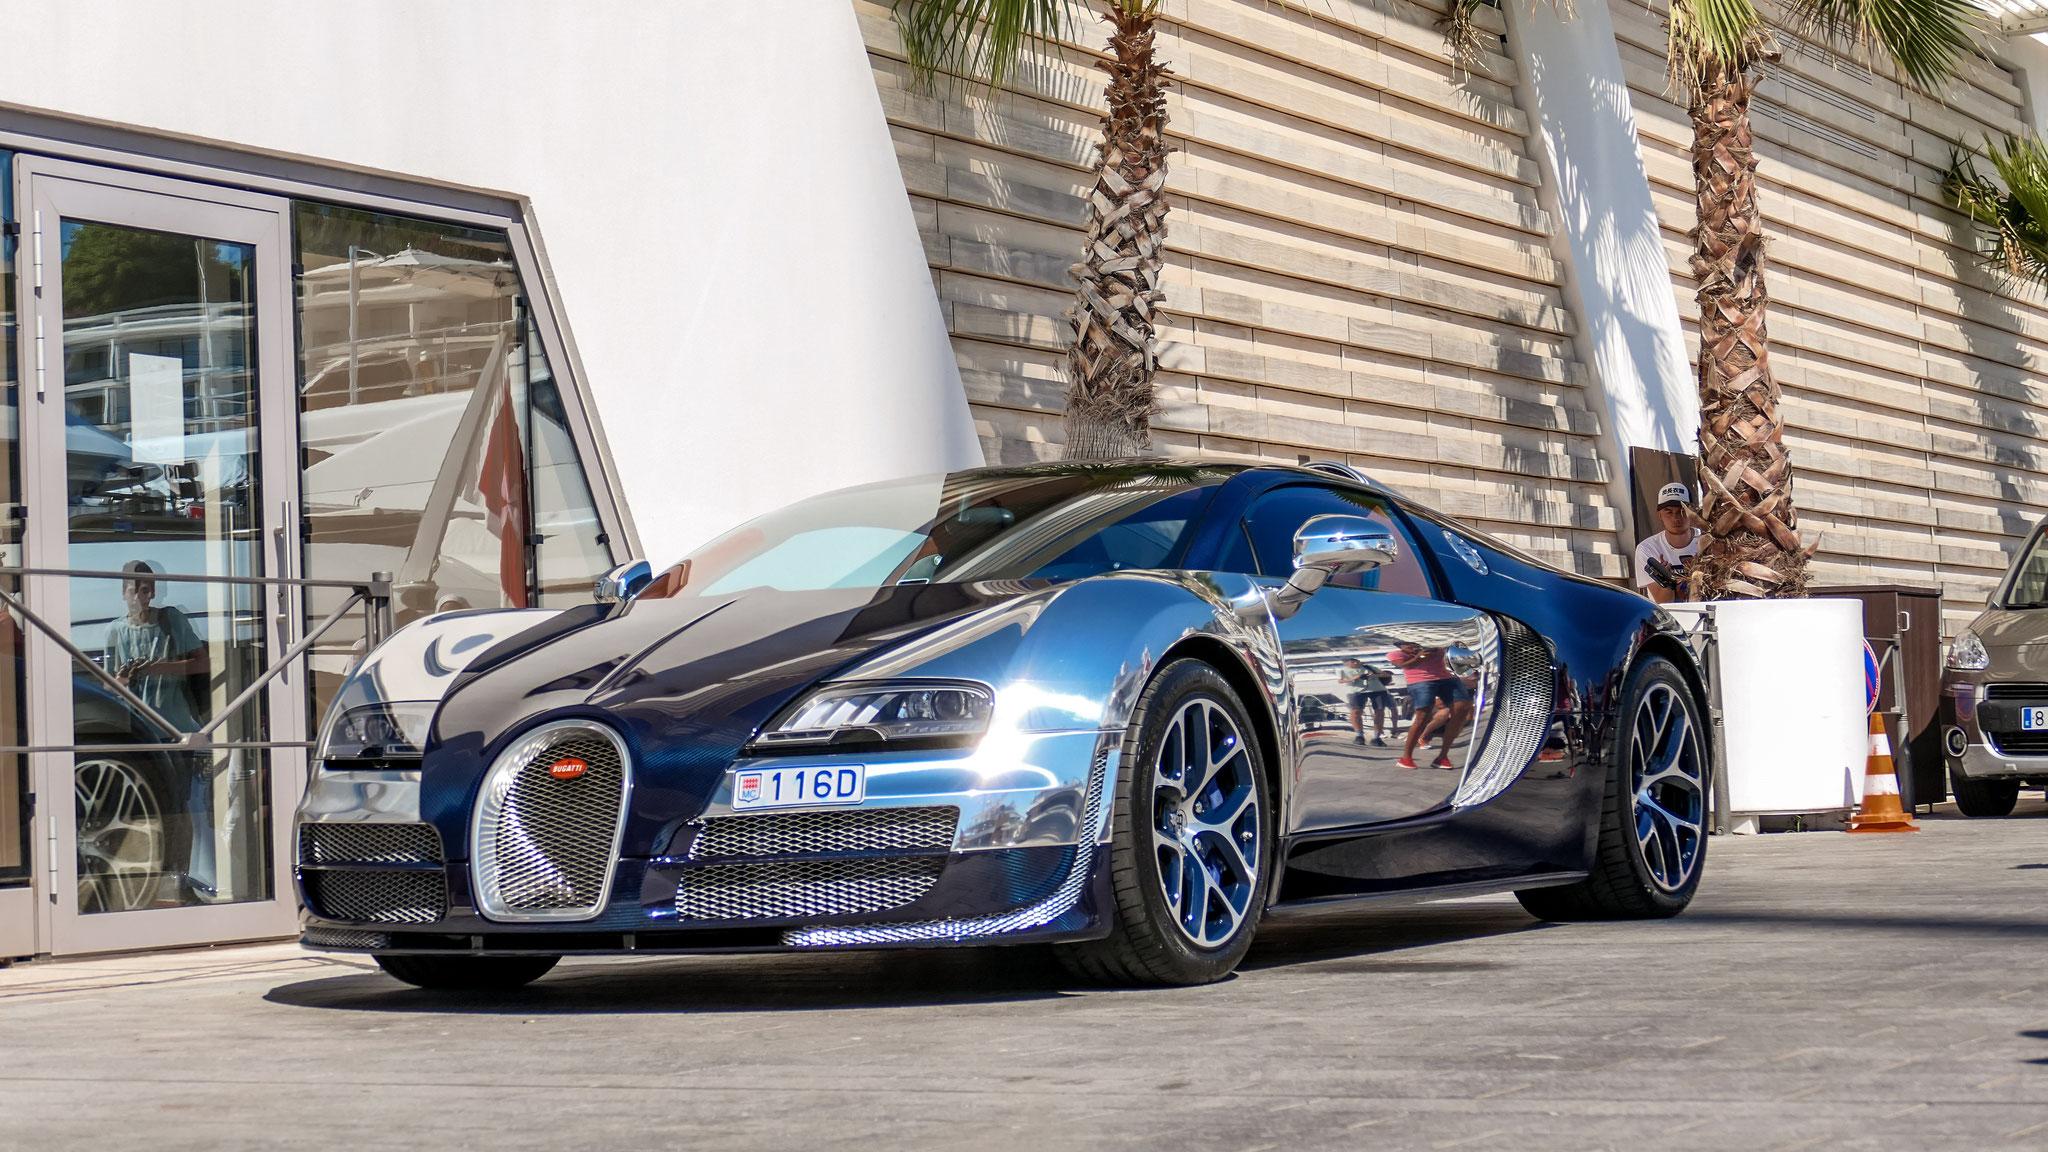 Bugatti Veyron Grand Sport Vitesse - 116D (MC)